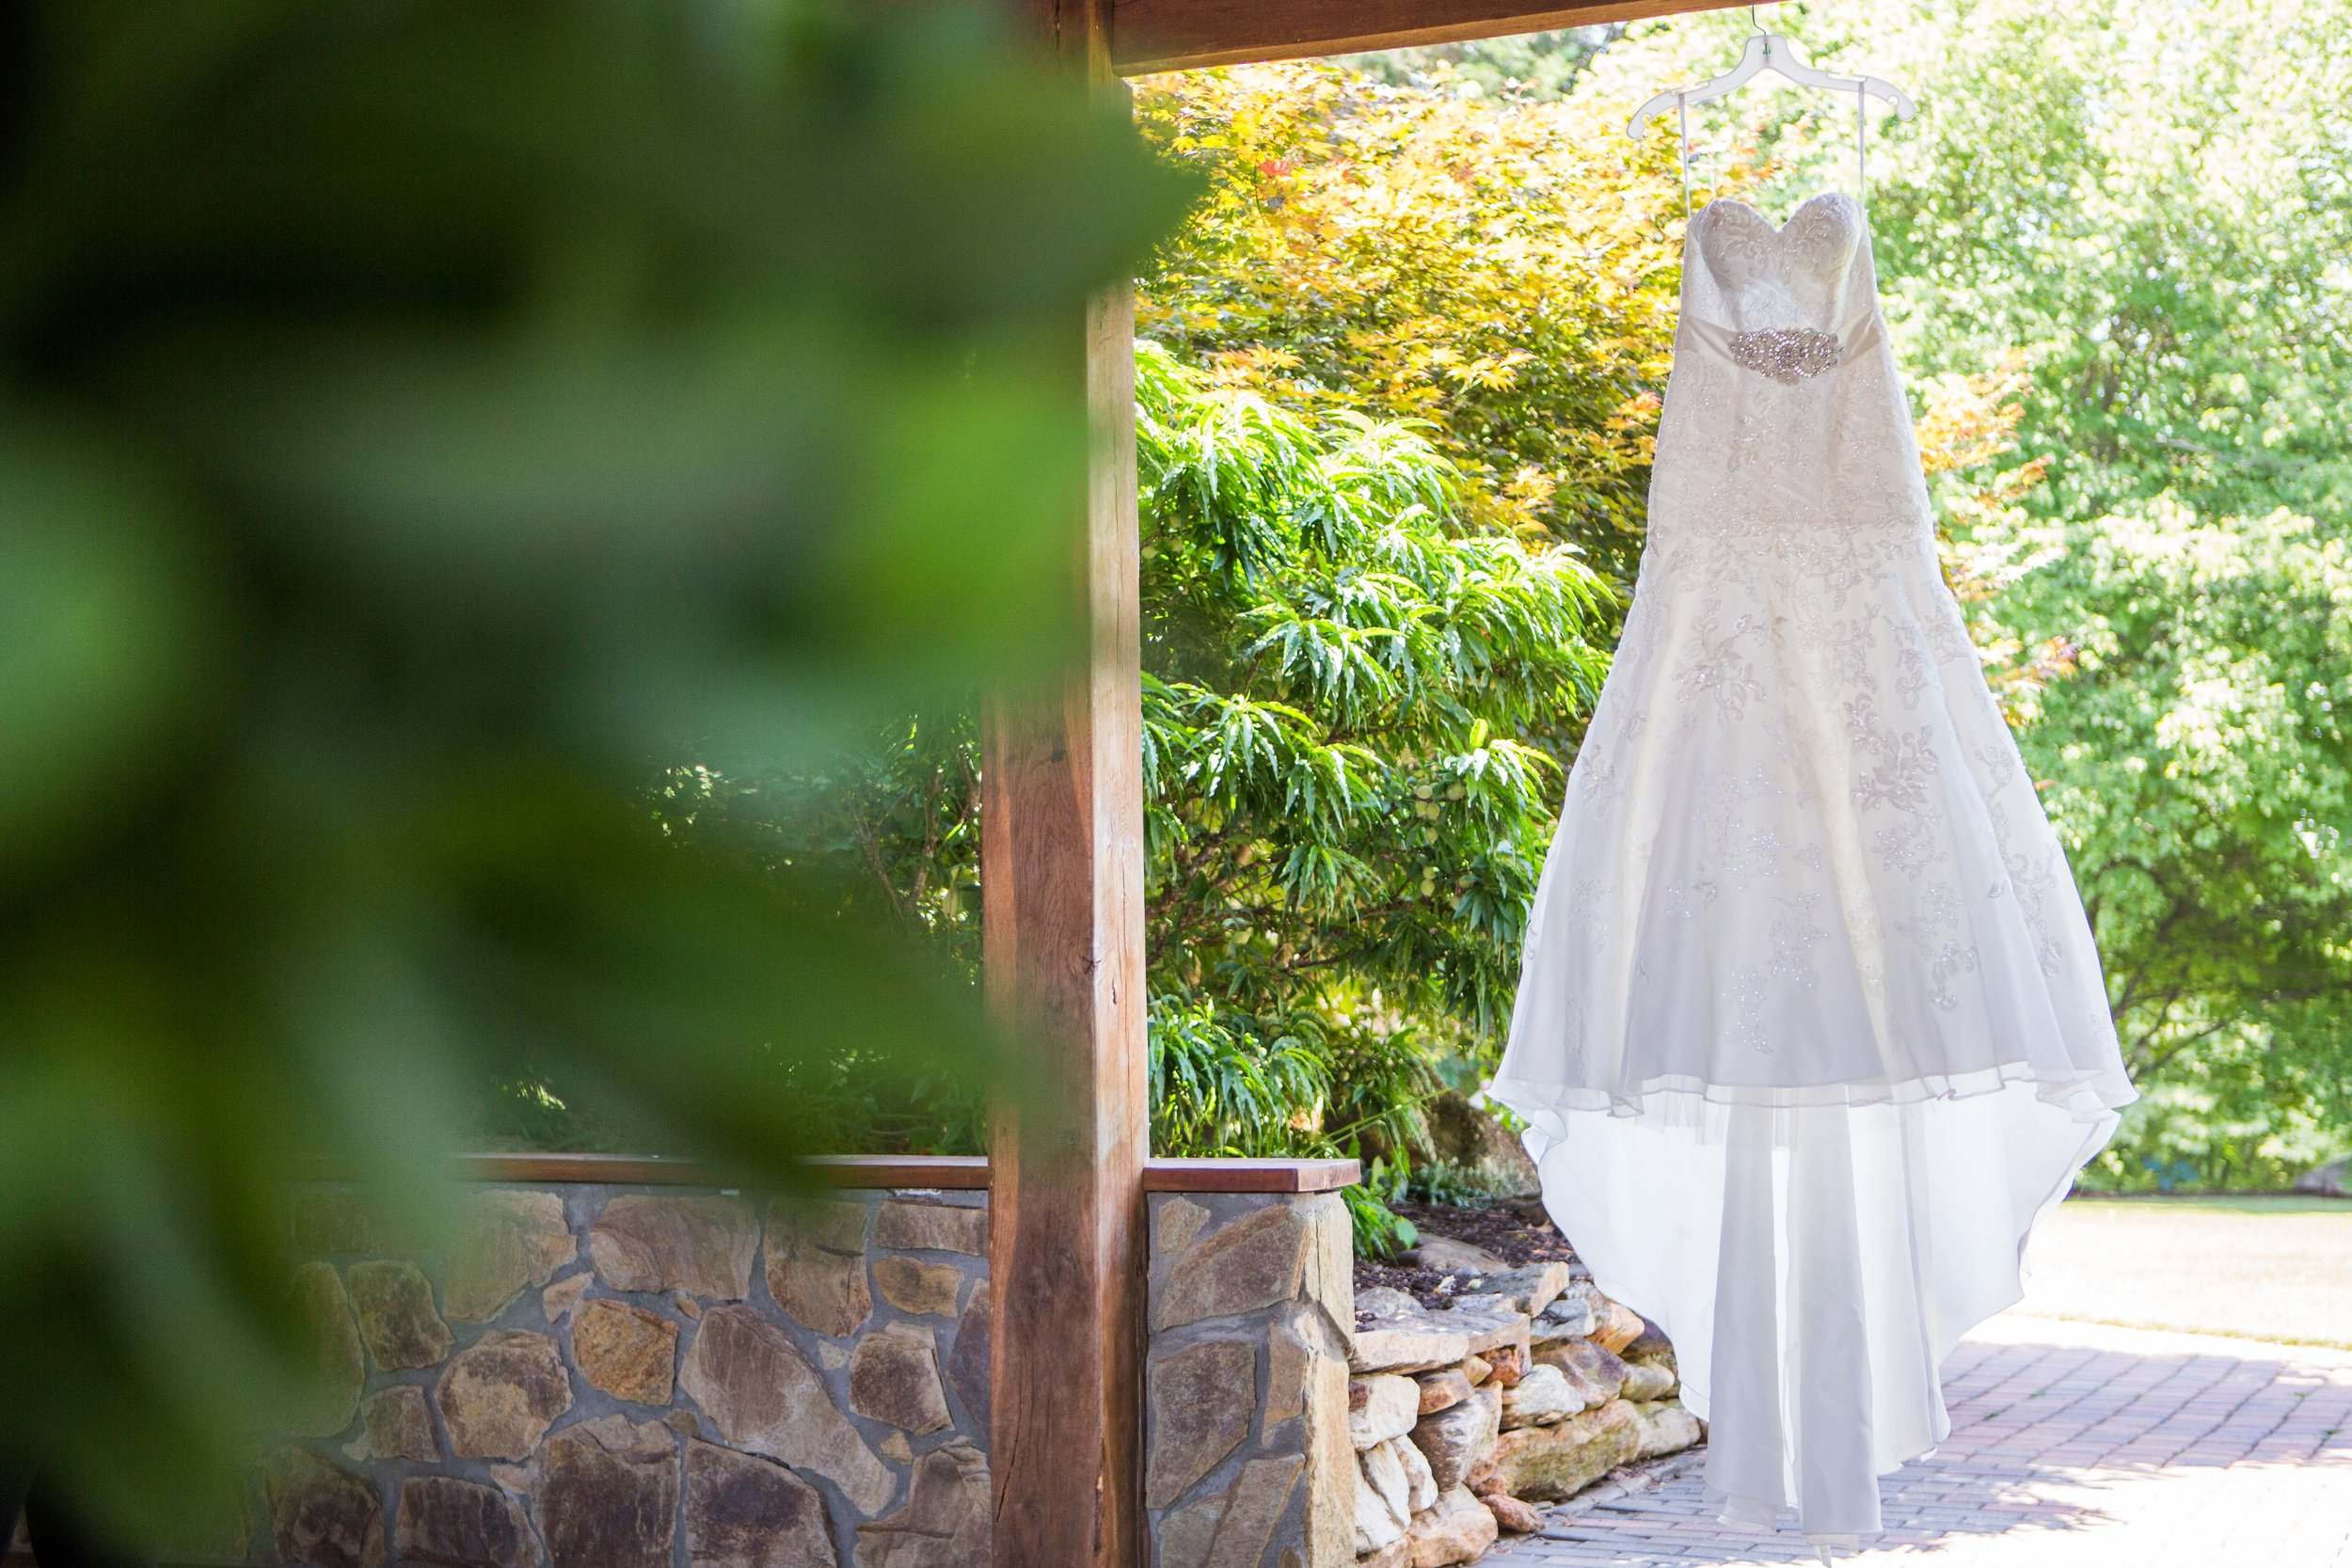 060416_Norris_Smith_Wedding_CF_1032.jpg